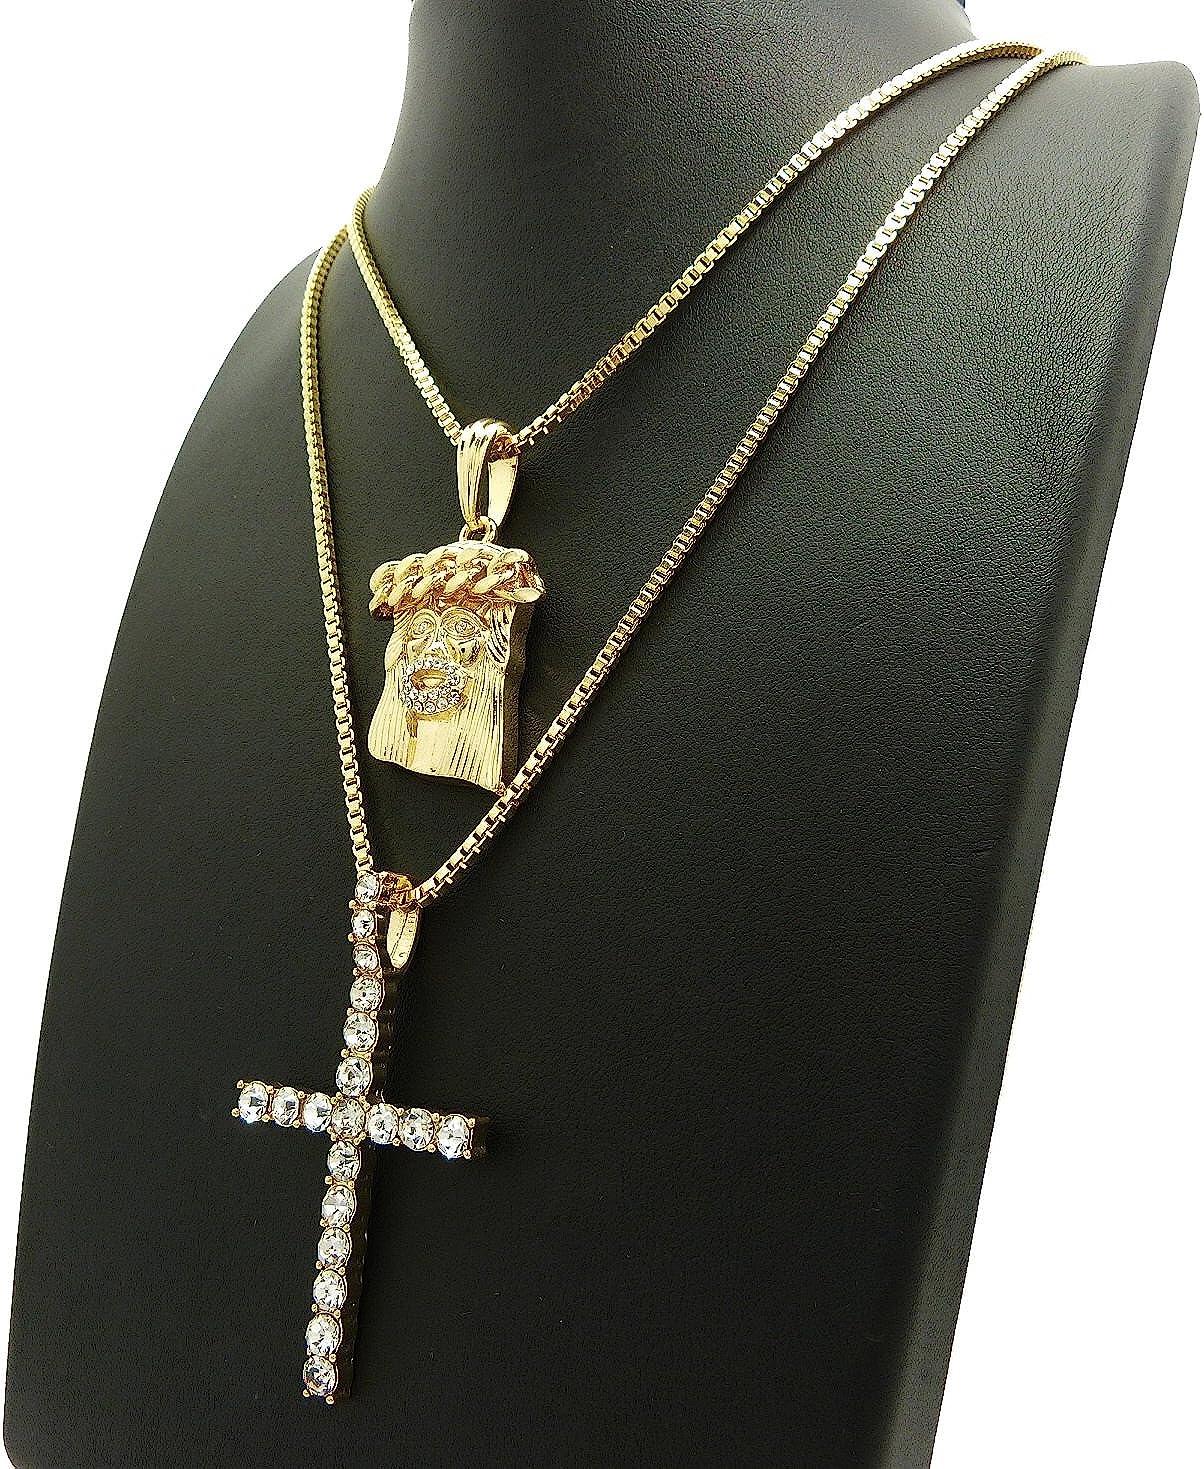 NYFASHION101 Stone Stud Slim Cross /& Crown of Thorns Jesus Head Pendant Set w//Box Chain Necklaces Gold-Tone